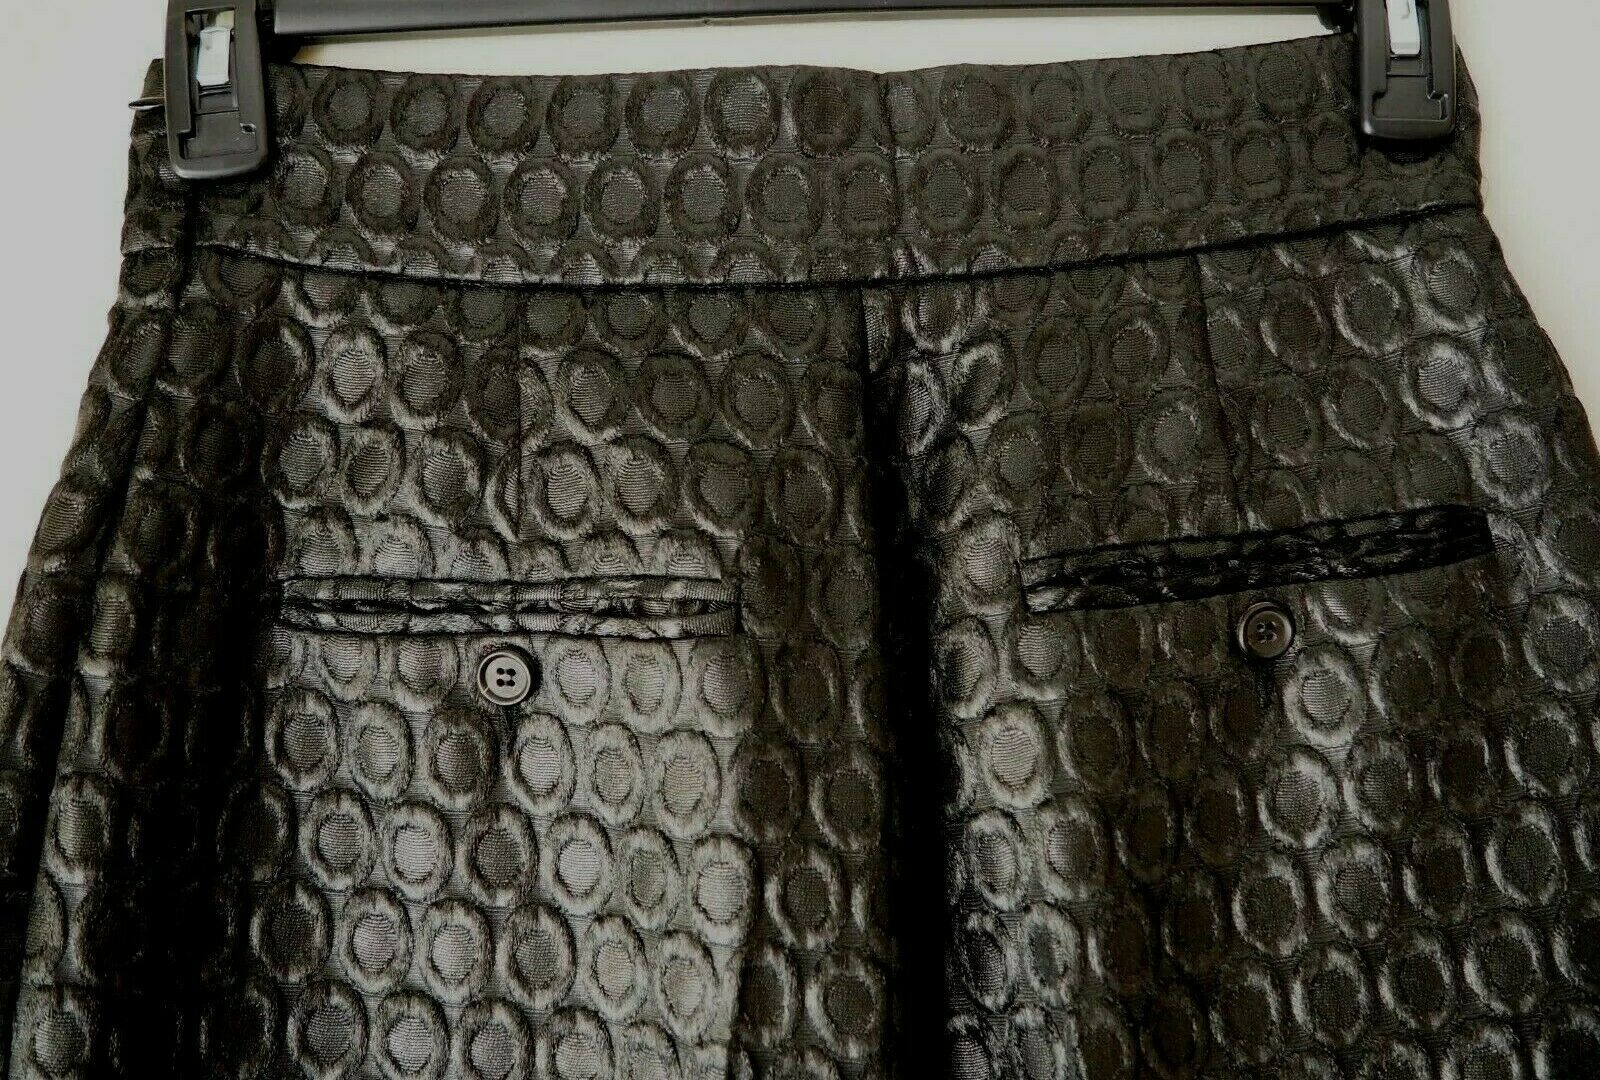 PRADA 1990's Vintage Pants Trousers Circular Desi… - image 7